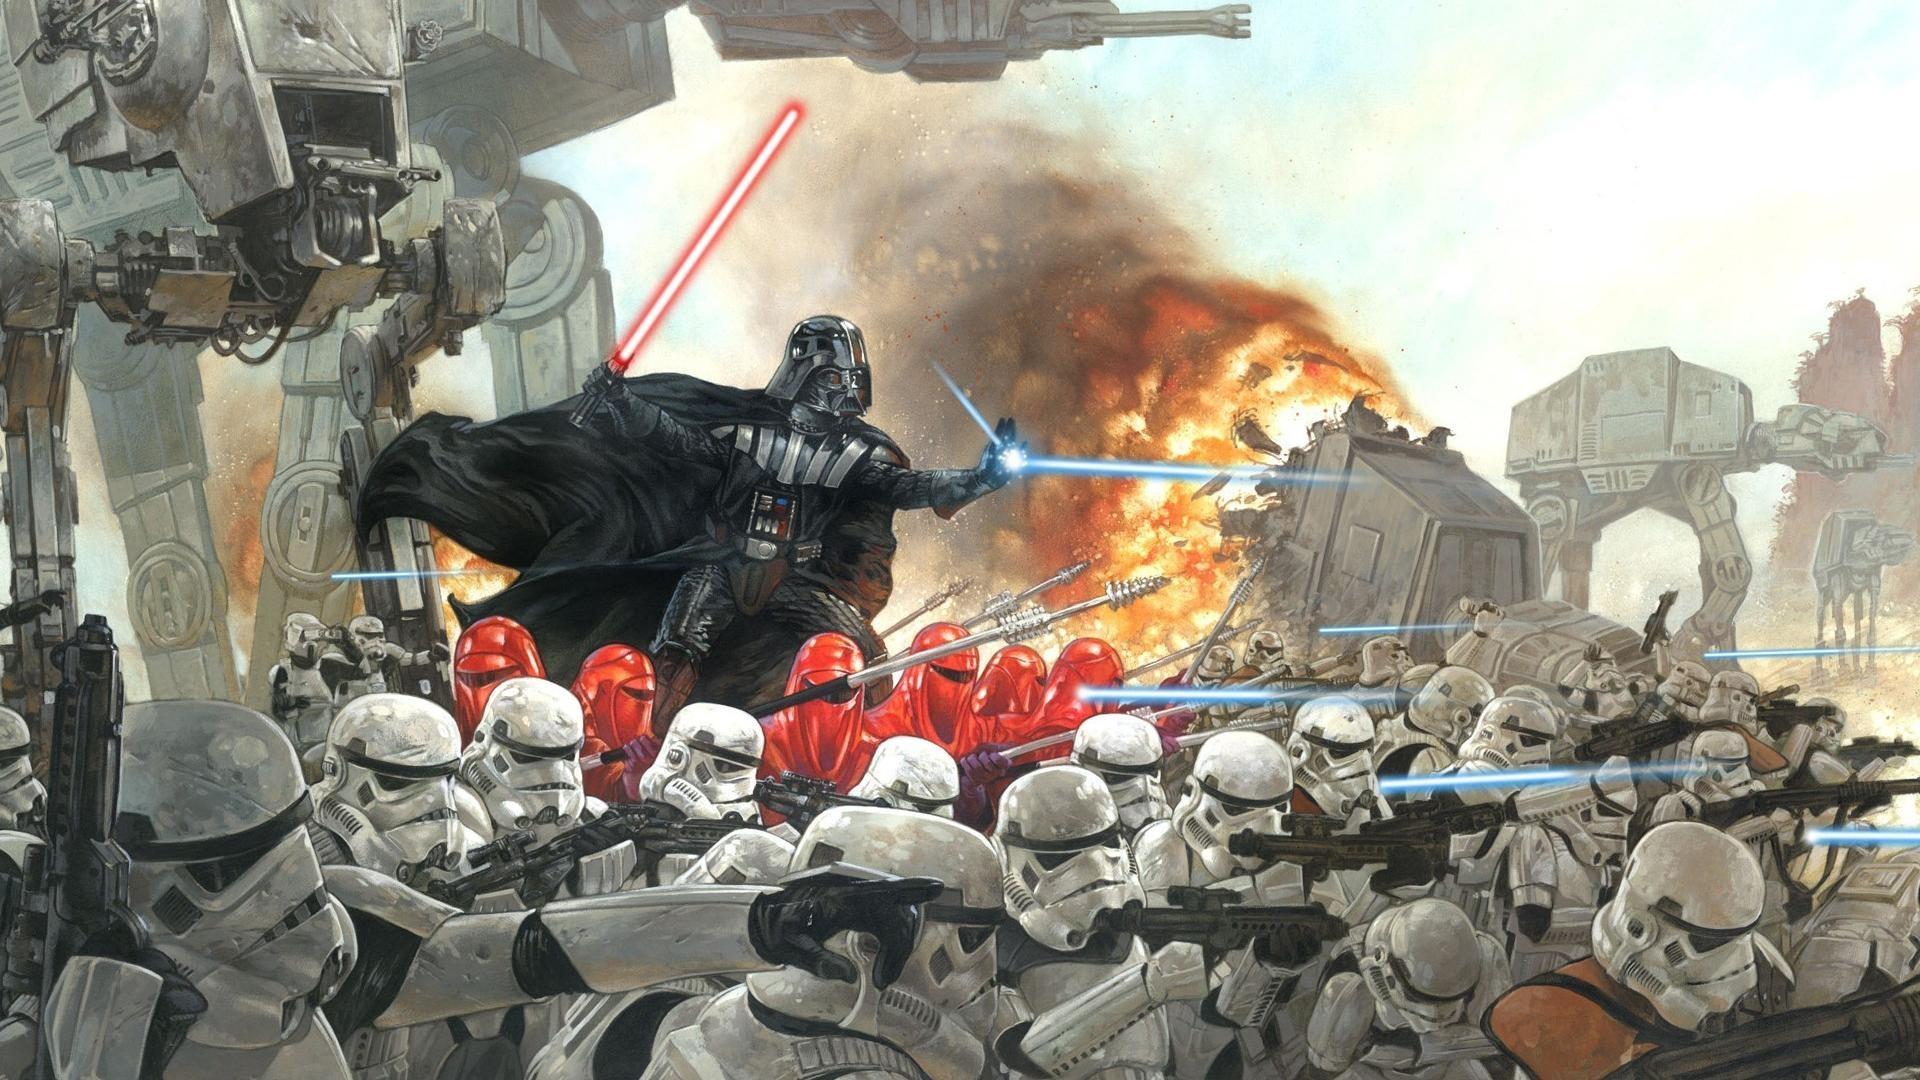 Star Wars free pic